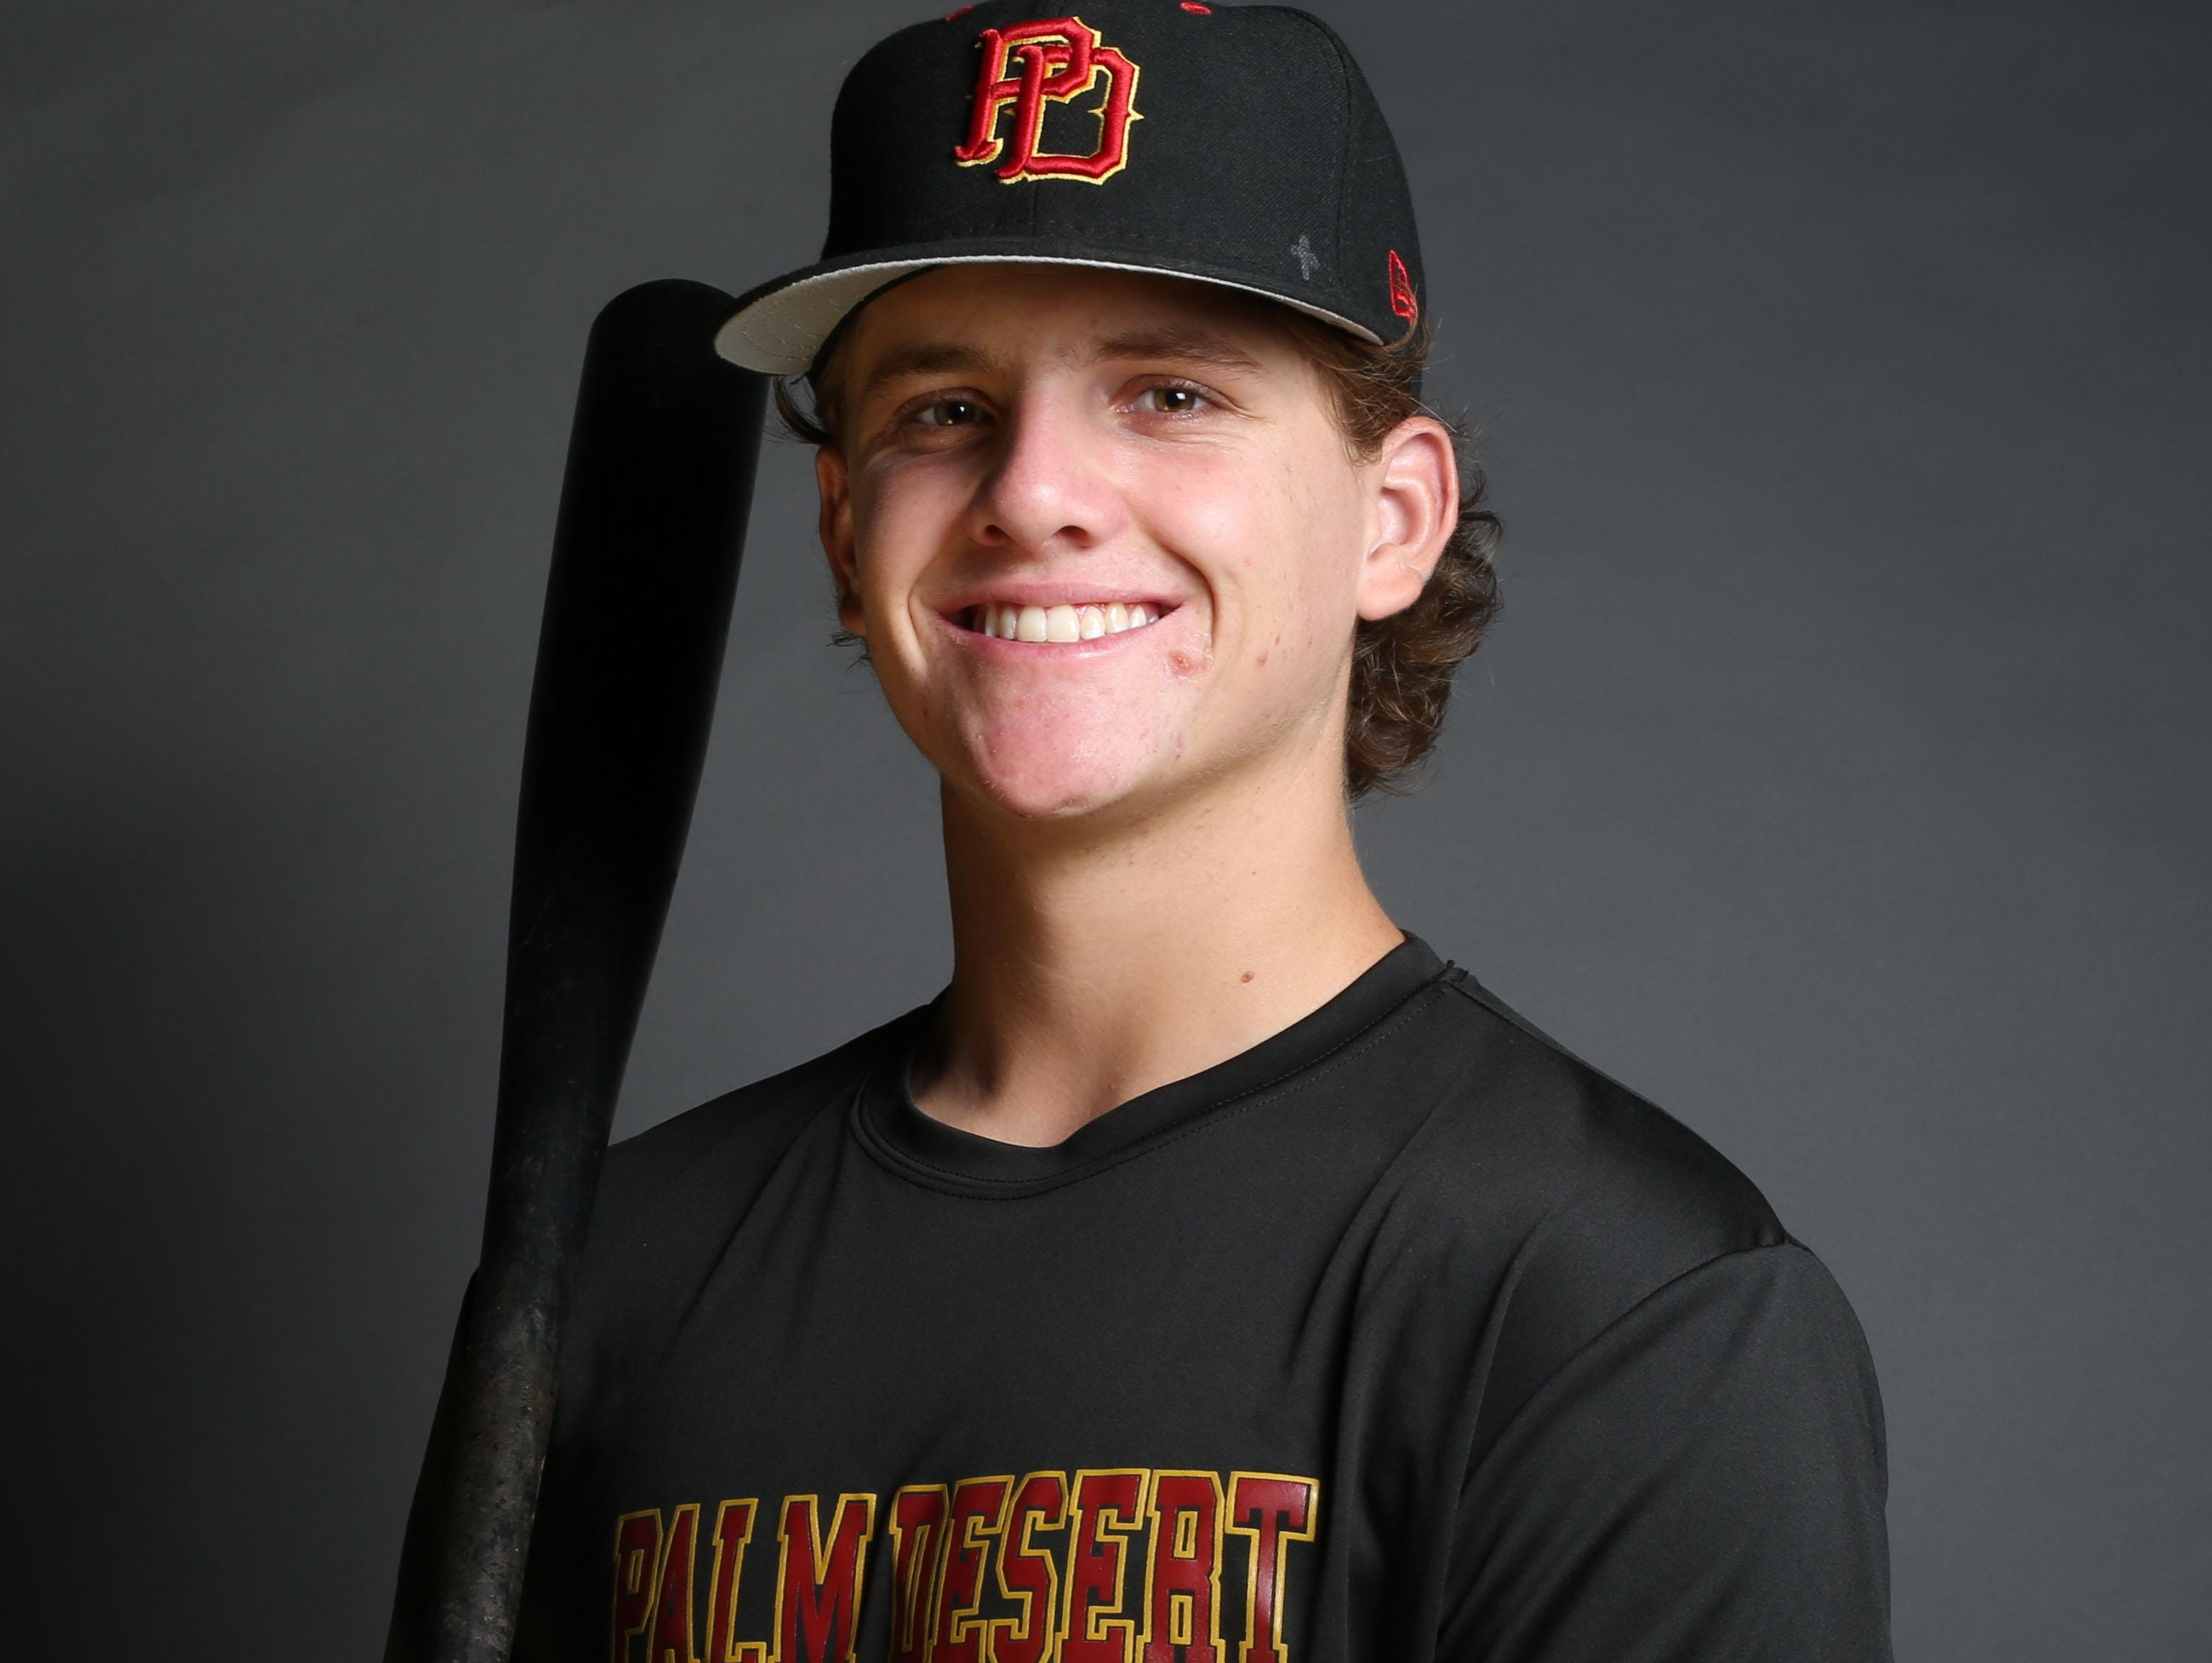 Travis Moniot of Palm Desert High School is the Desert Sun's top baseball player this season.